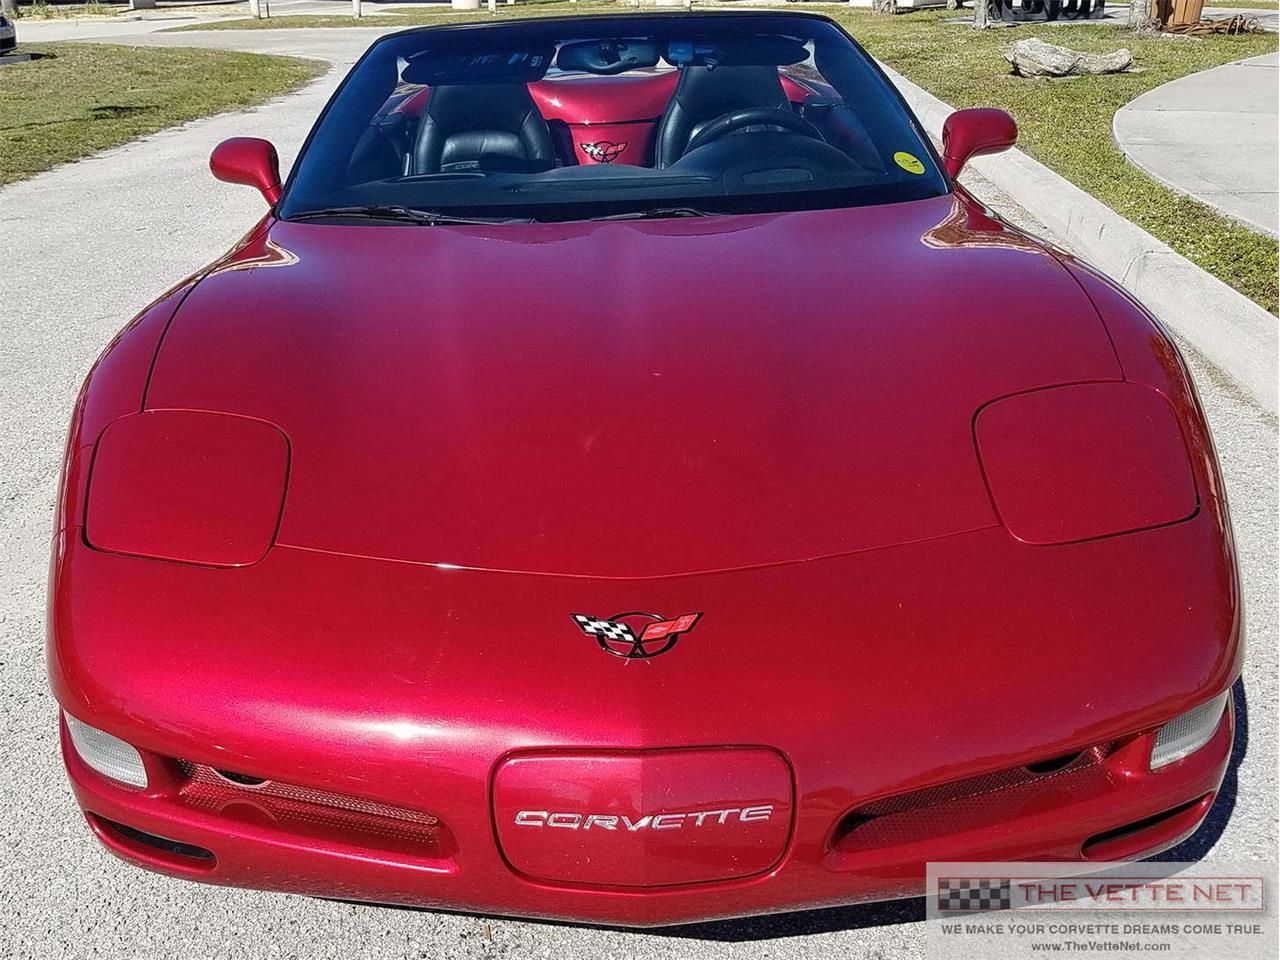 2004 Chevrolet Corvette (CC-1173609) for sale in Sarasota, Florida